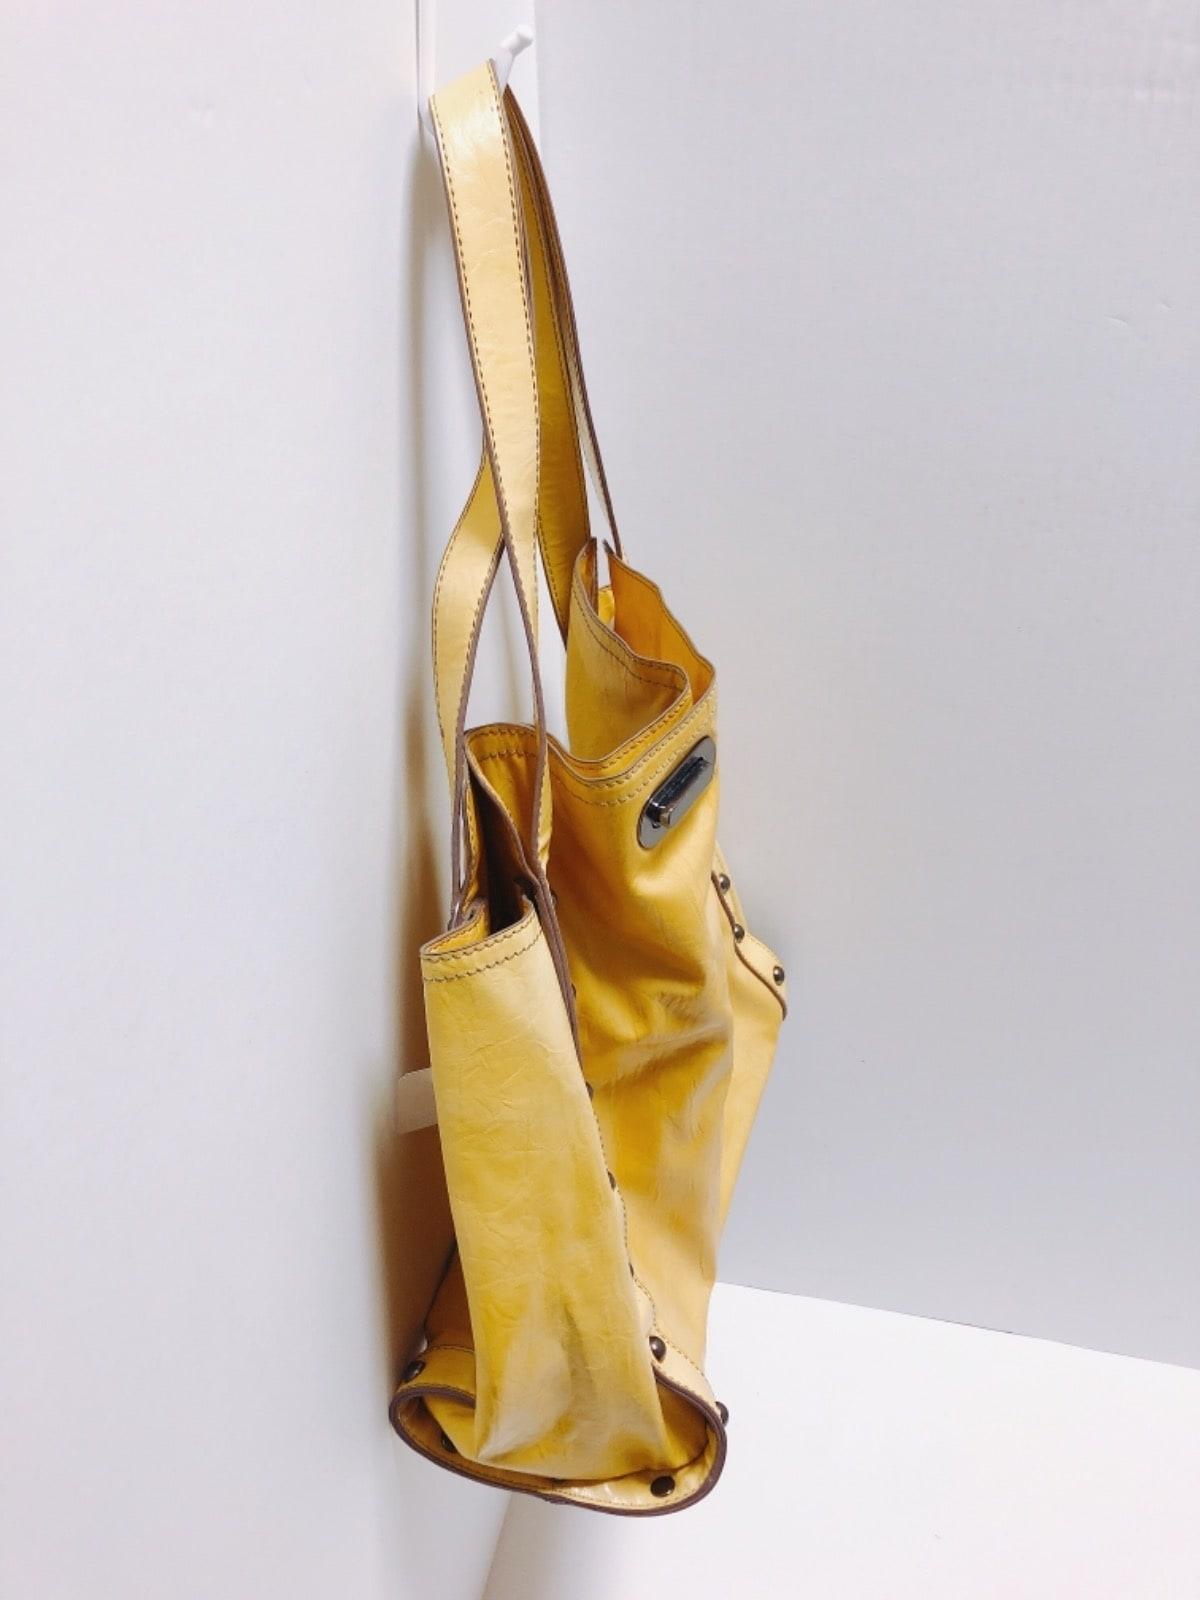 melie bianco(メリービアンコ)のトートバッグ